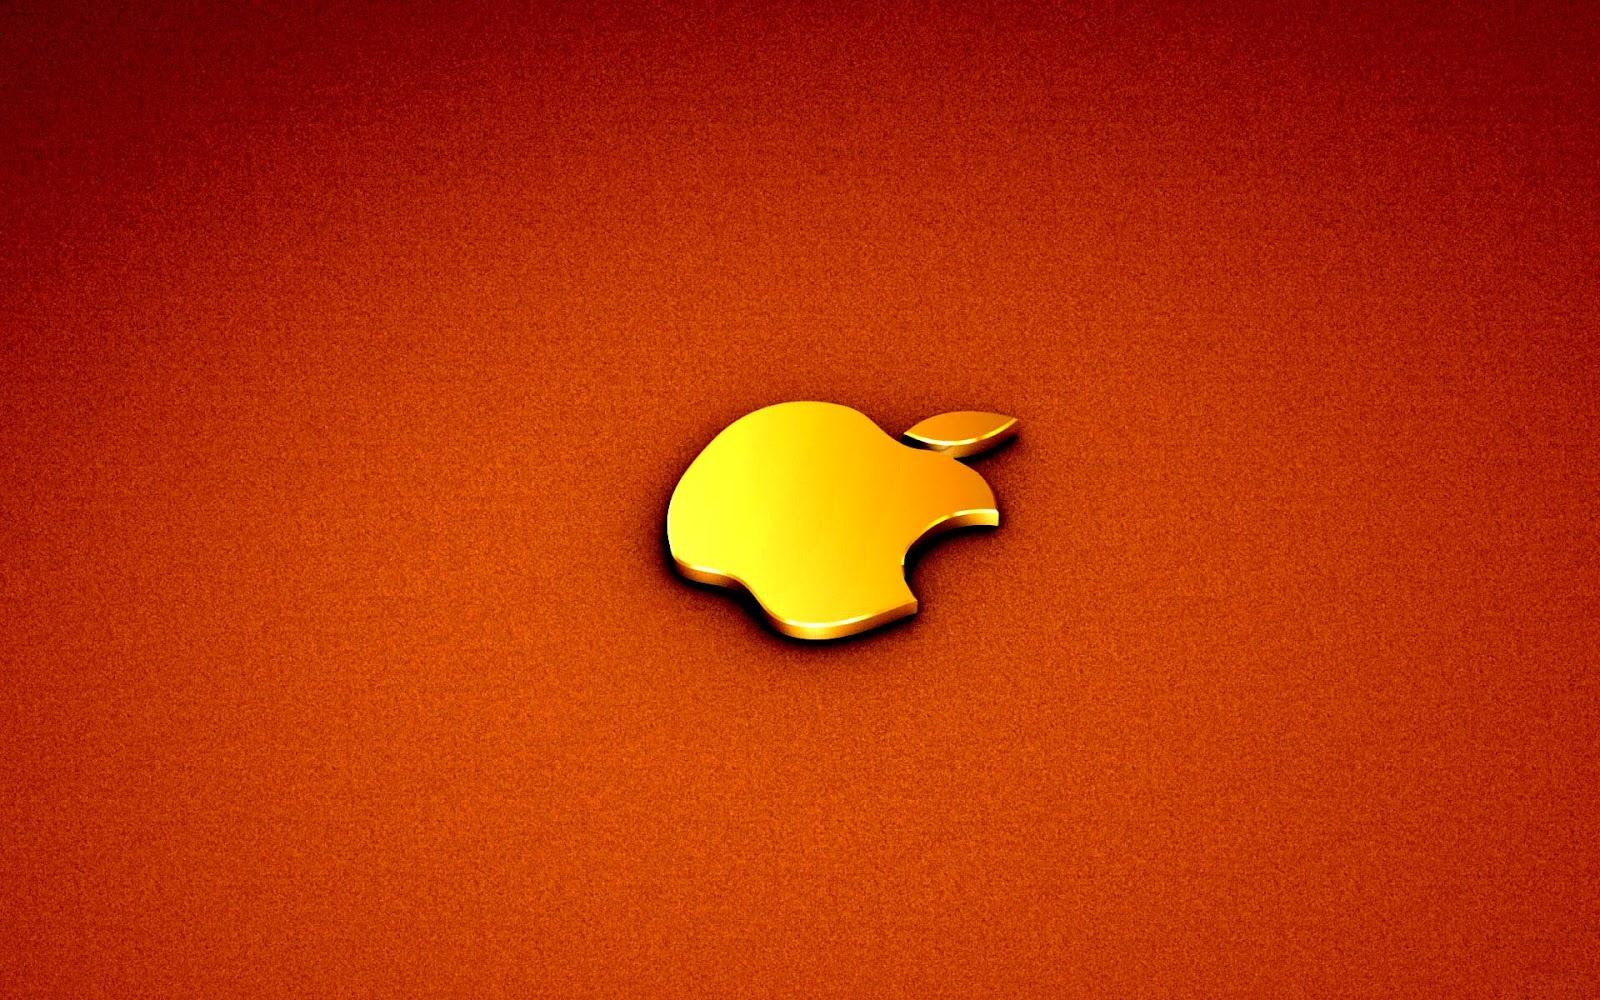 http://1.bp.blogspot.com/--izimrWG0dg/UF4OMQRKykI/AAAAAAAAANk/q8vdAatQQhQ/s1600/gold-golden-apple-logo-wallpaper.jpg